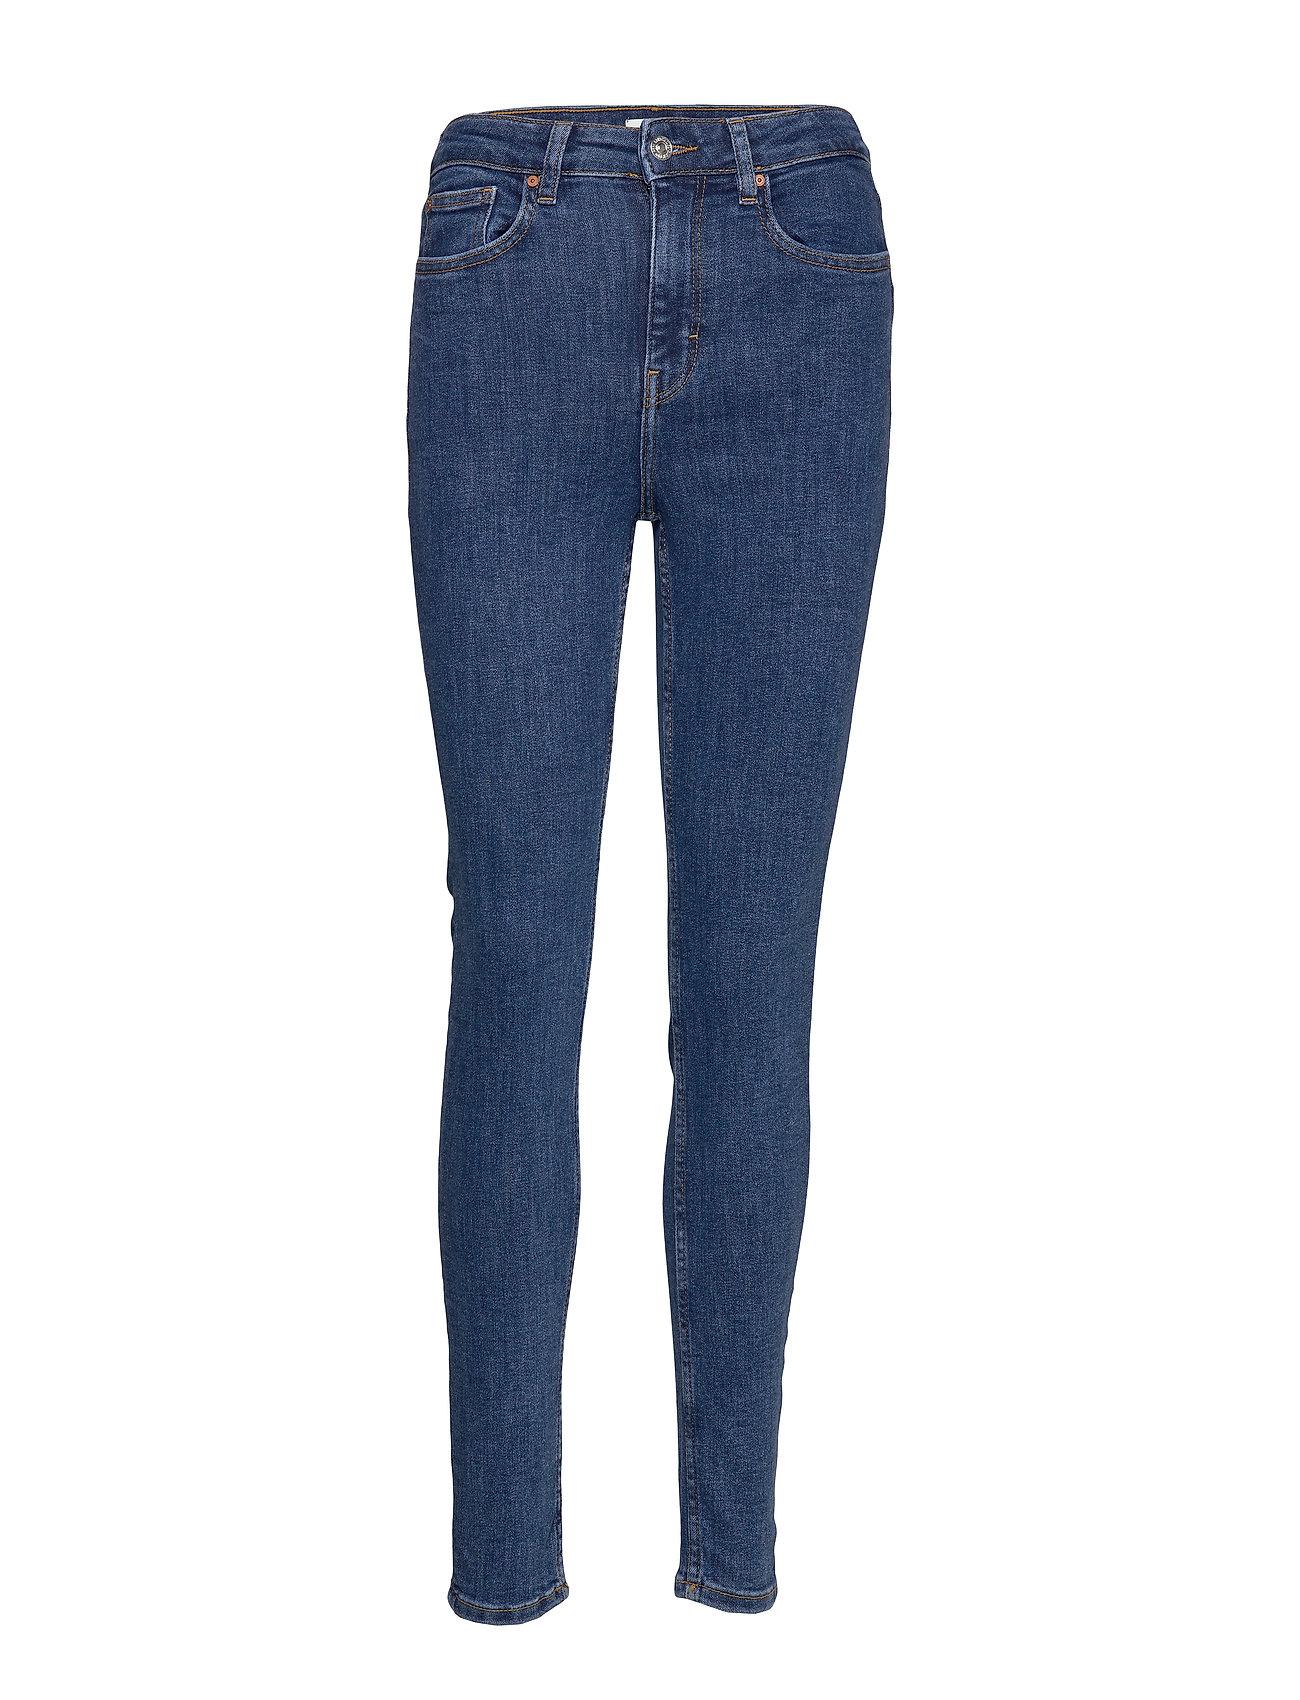 Mango Jeans skinny high waist Soho - OPEN BLUE